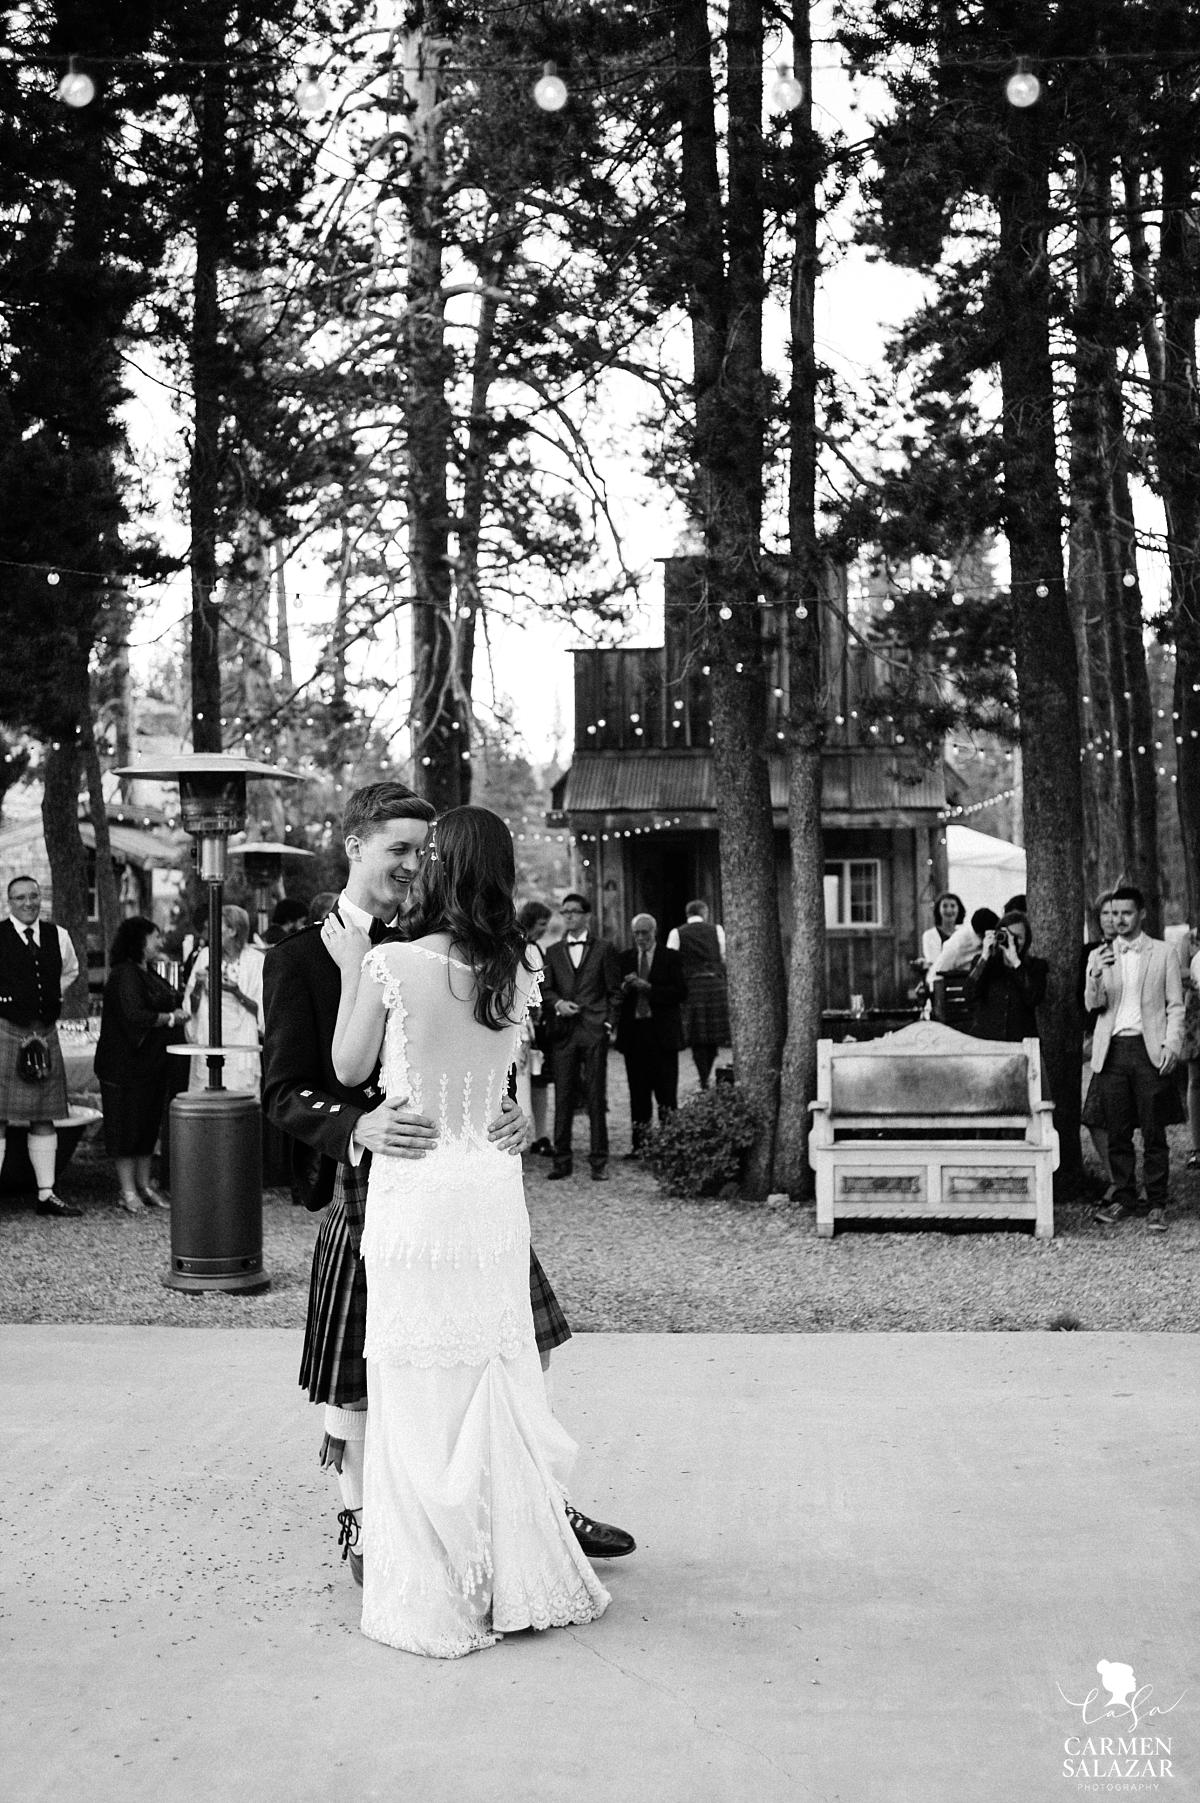 Vintage fairytale wedding reception in the woods - Carmen Salazar